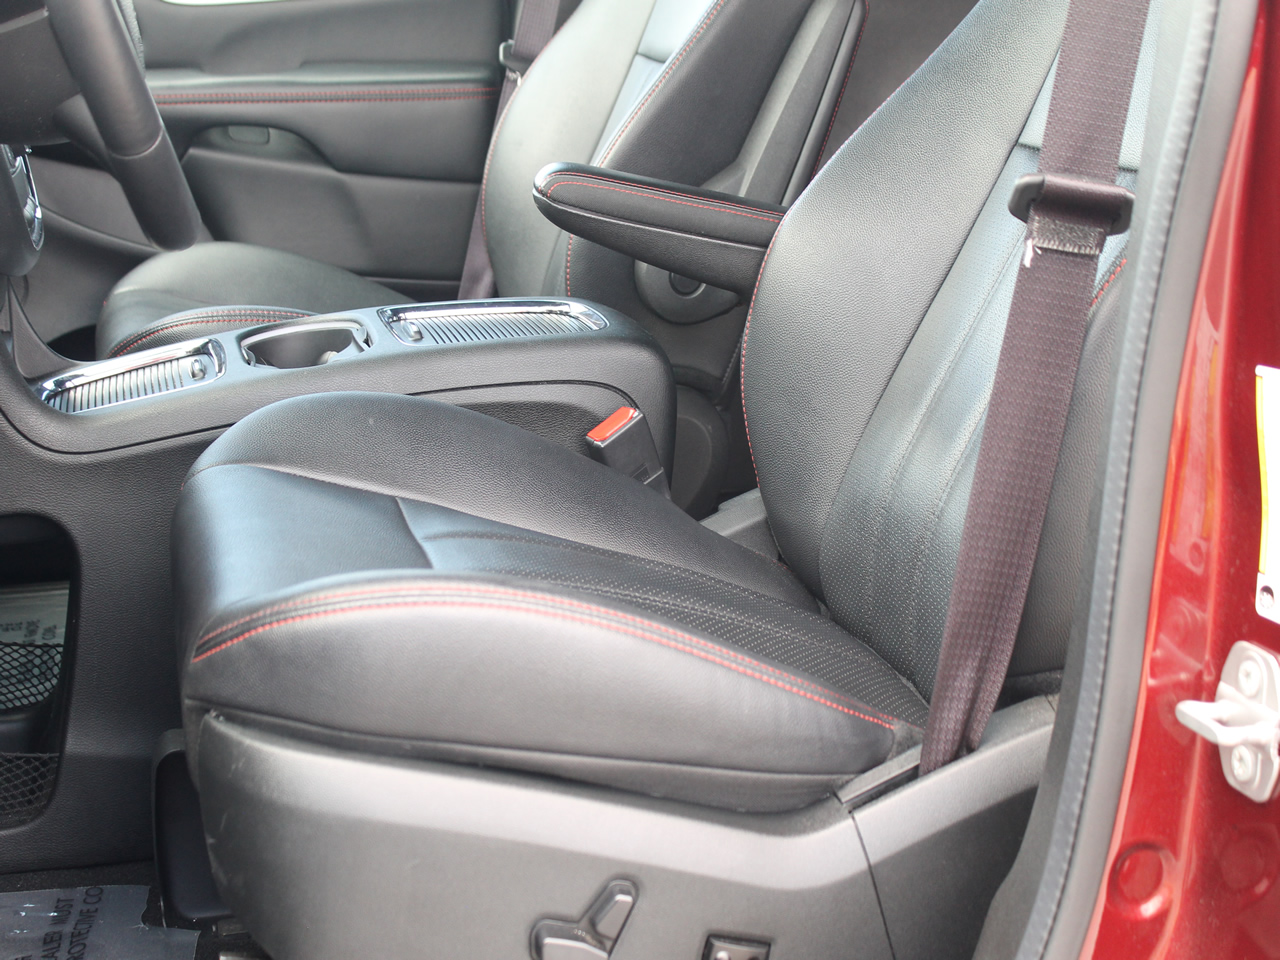 Dick Smith Hyundai >> USED 2018 DODGE GRAND CARAVAN GT VIN 2C4RDGEG3JR284161 - Hyundai in Greenville | Hyundai ...